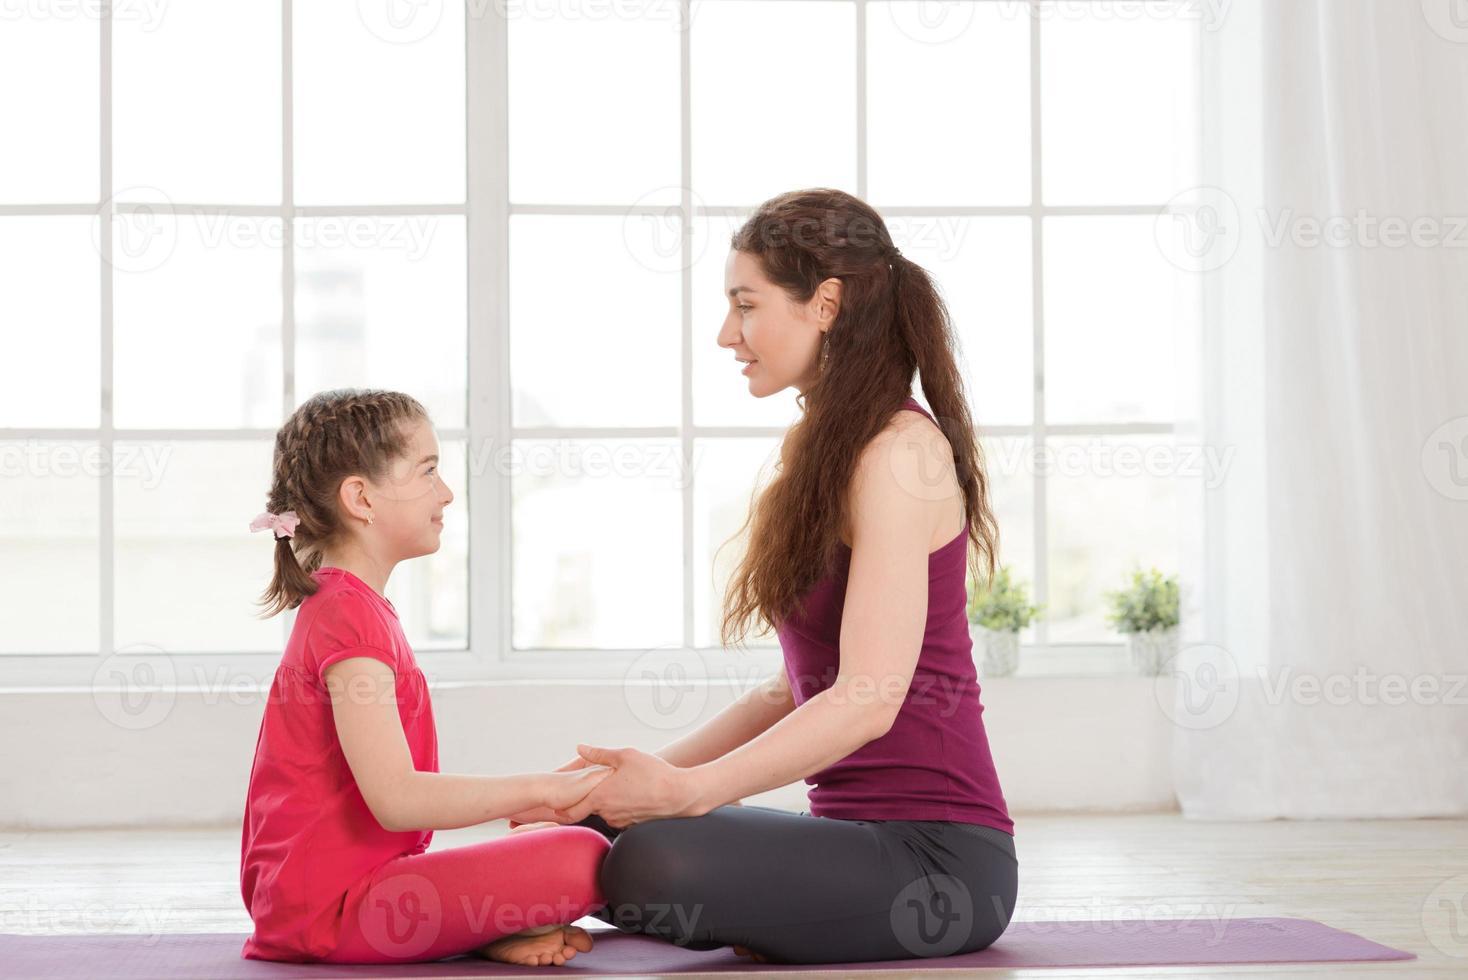 joven madre e hija haciendo ejercicio de yoga foto